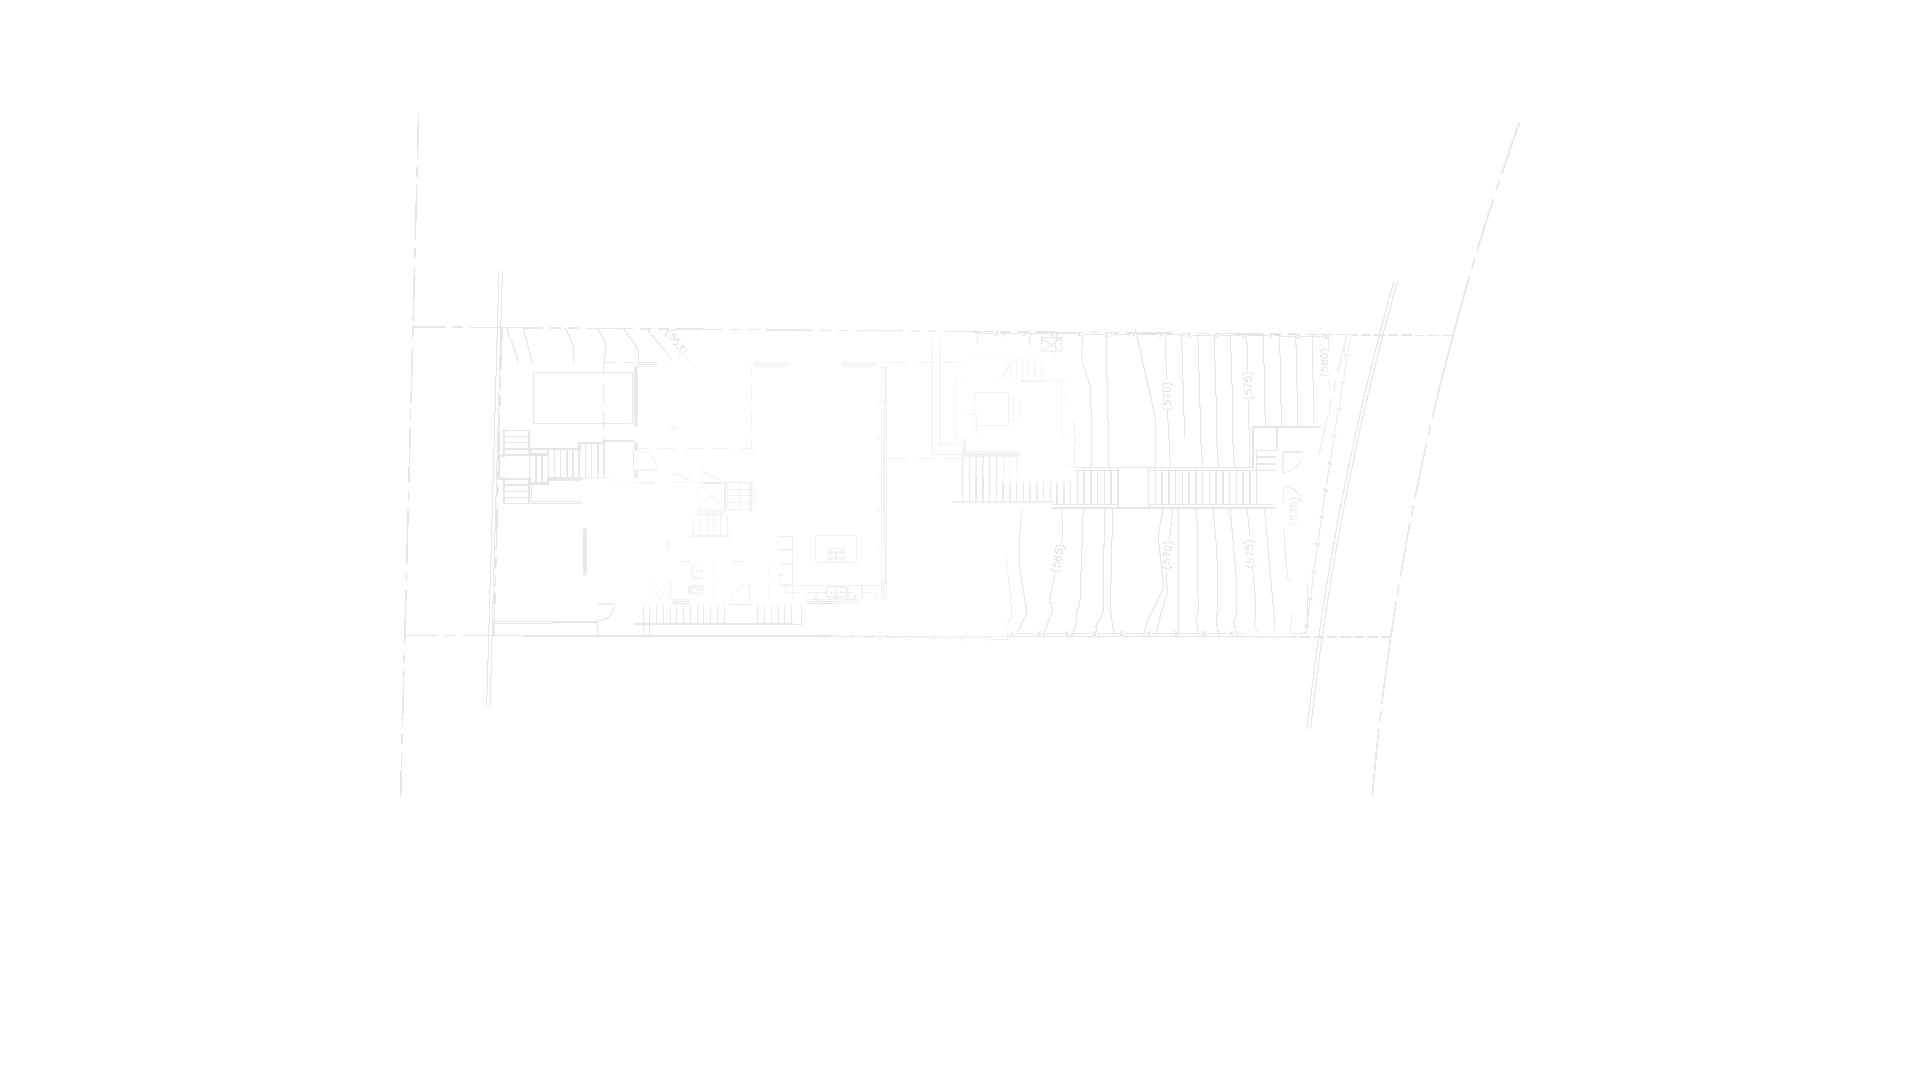 Redrock_TechDwg-02.png